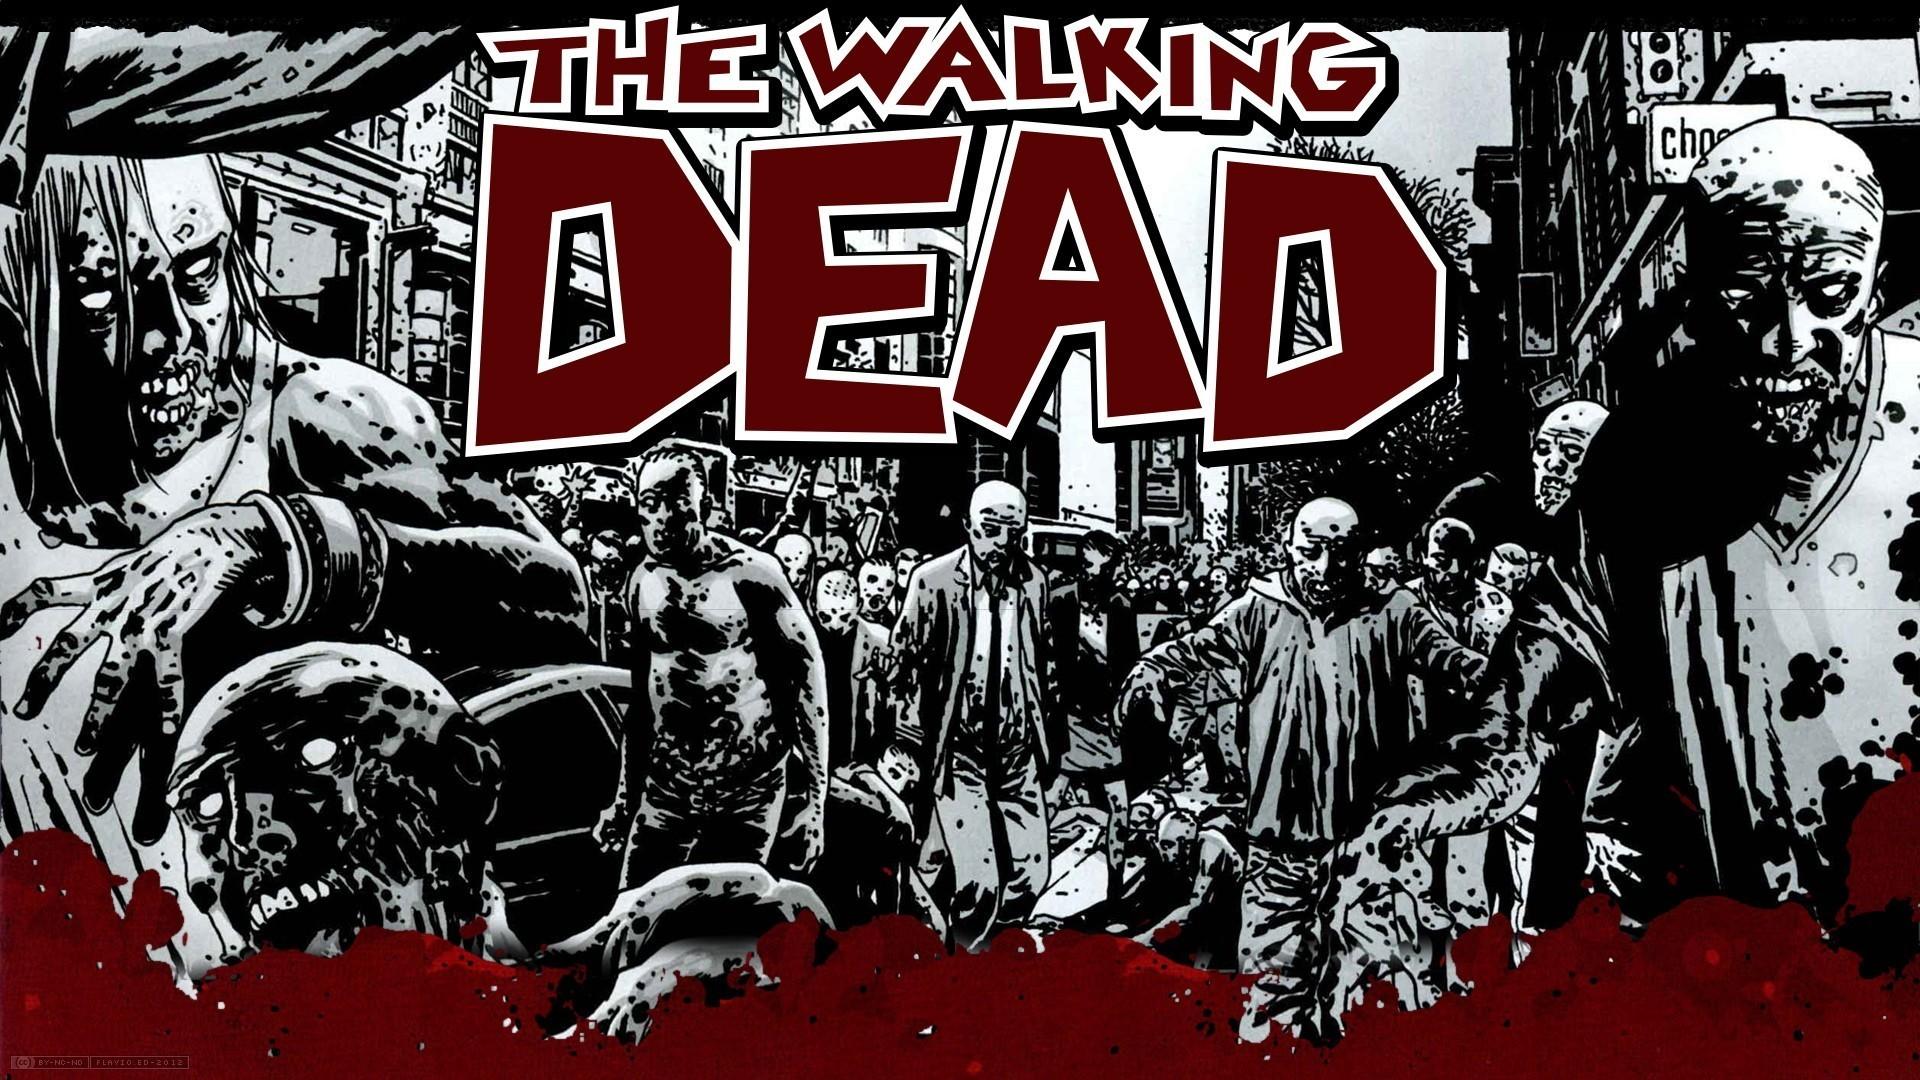 The Walking Dead Wallpaper Pictures 1920×1080 The Walking Dead Wallpapers  1920×1080 (51 Wallpapers)   Adorable Wallpapers   Desktop   Pinterest    Wallpaper …